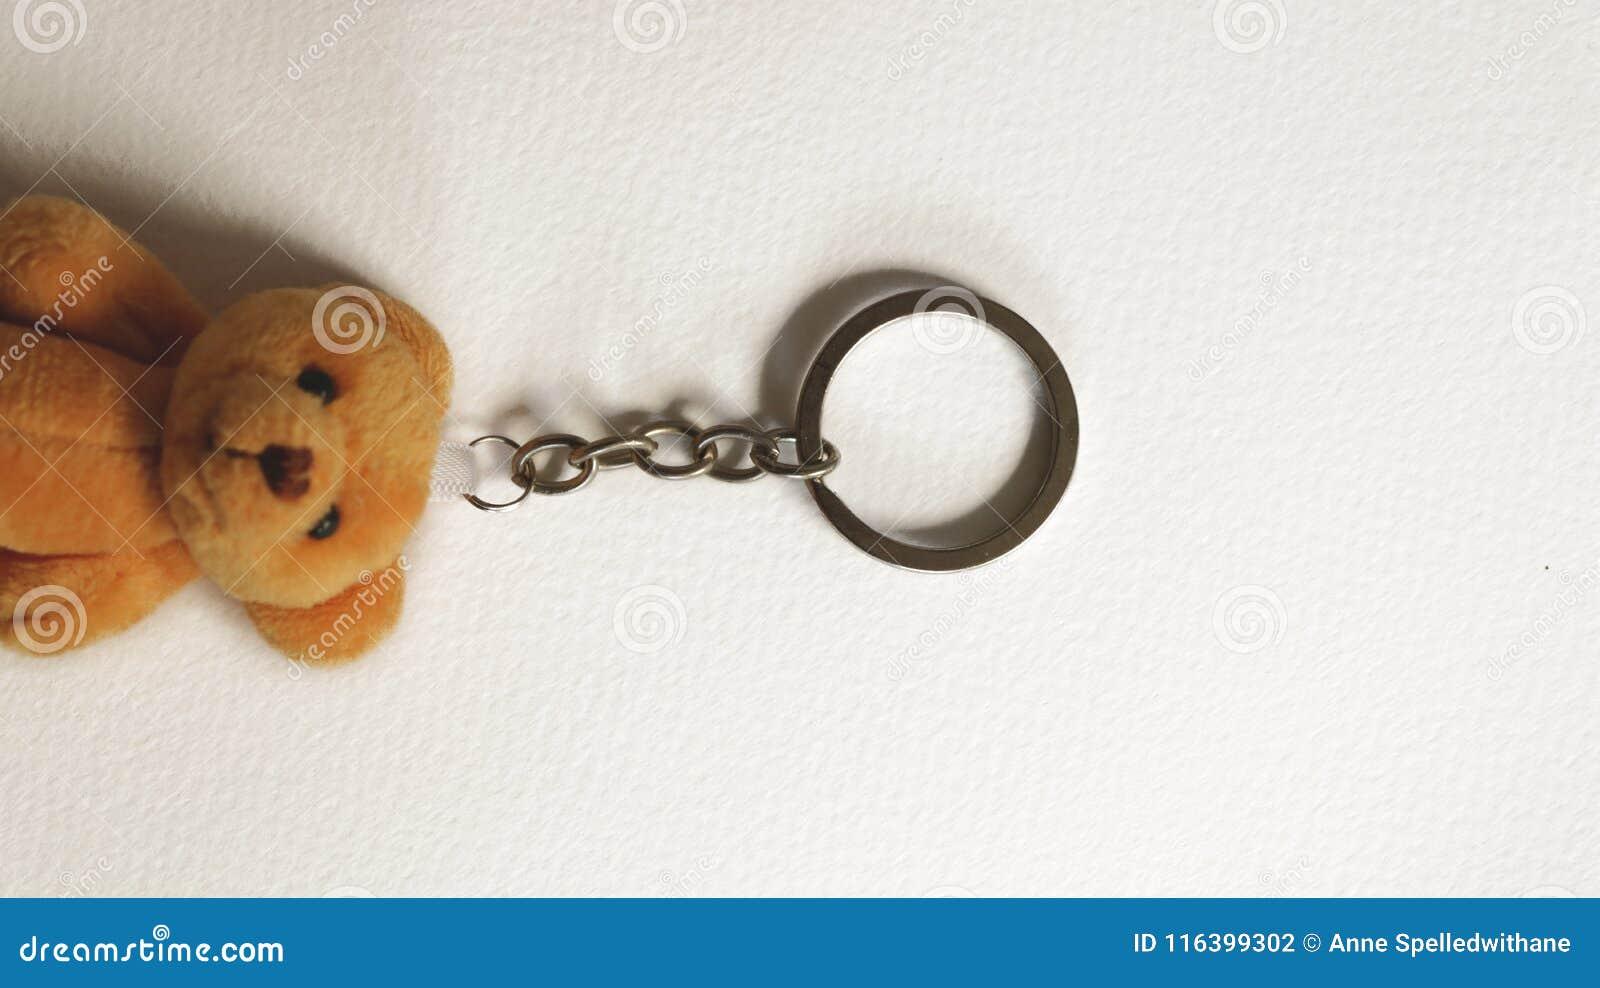 Uitstekend Metaal Keychain met Teddy Bear op Document Textuur